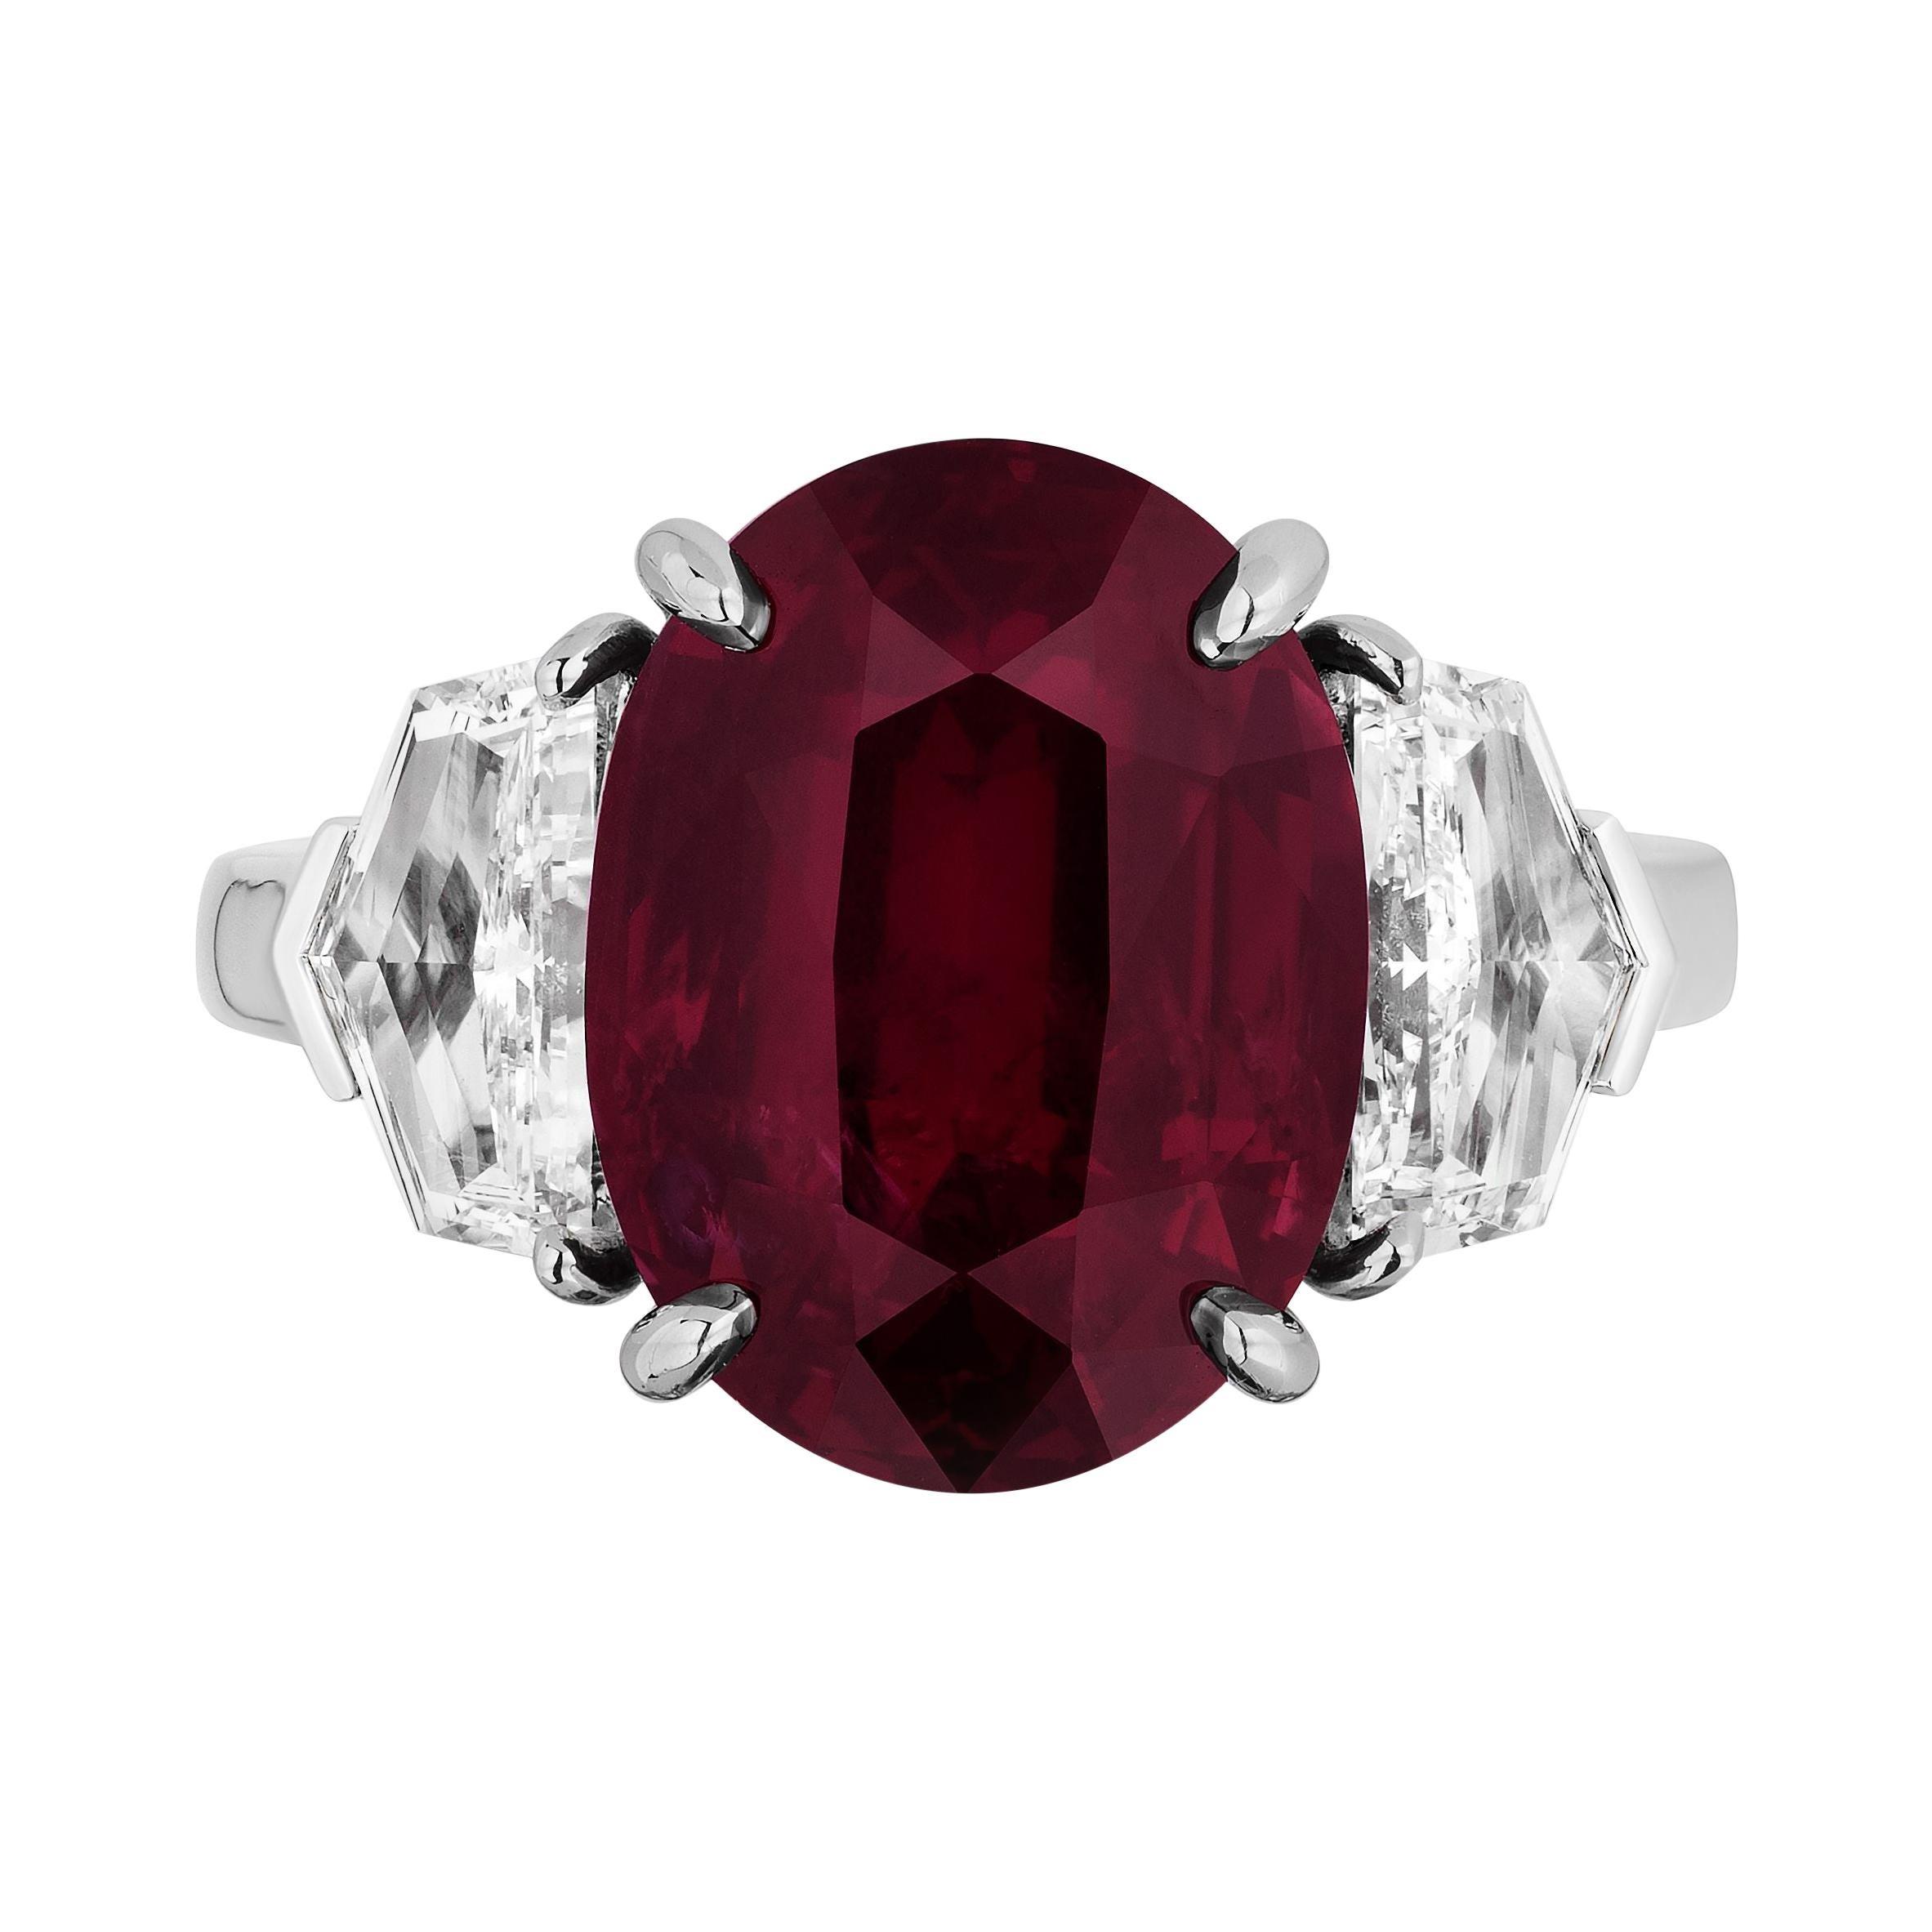 GIA Certified 10.07 Carat Ruby Diamond Three Stone Ring